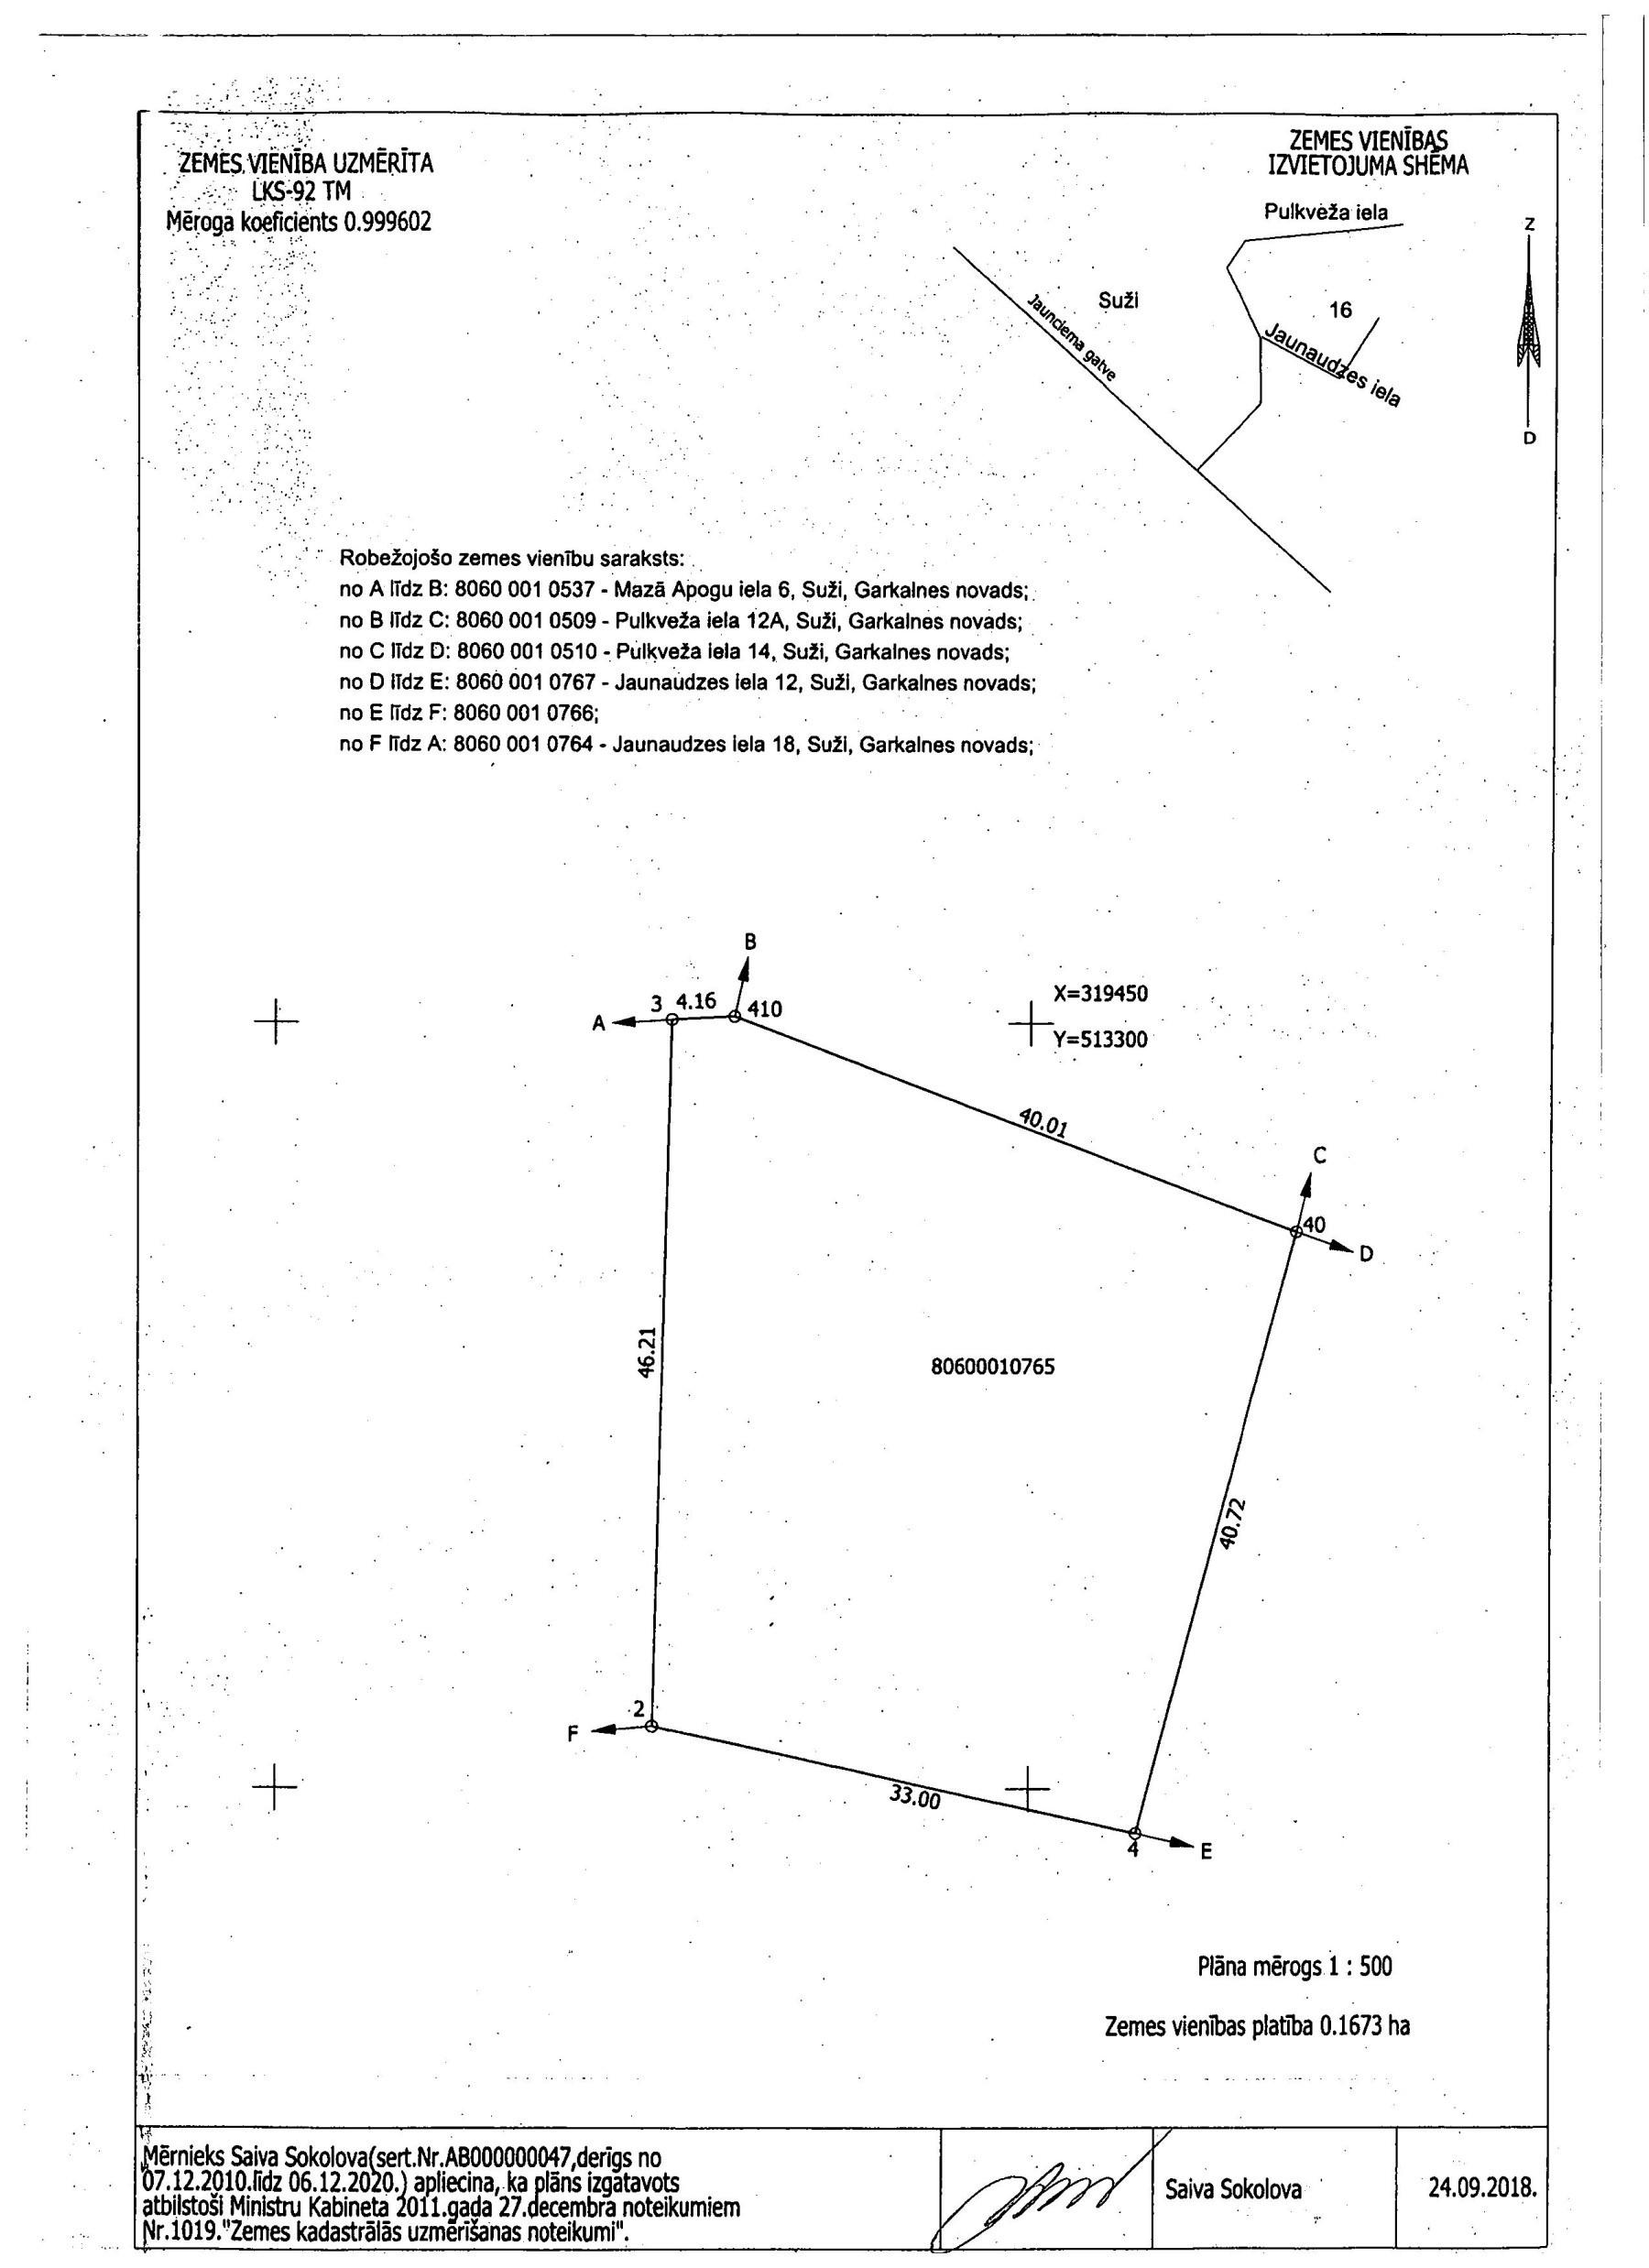 GARKALNES, SUZI, Jaunaudzes - 16